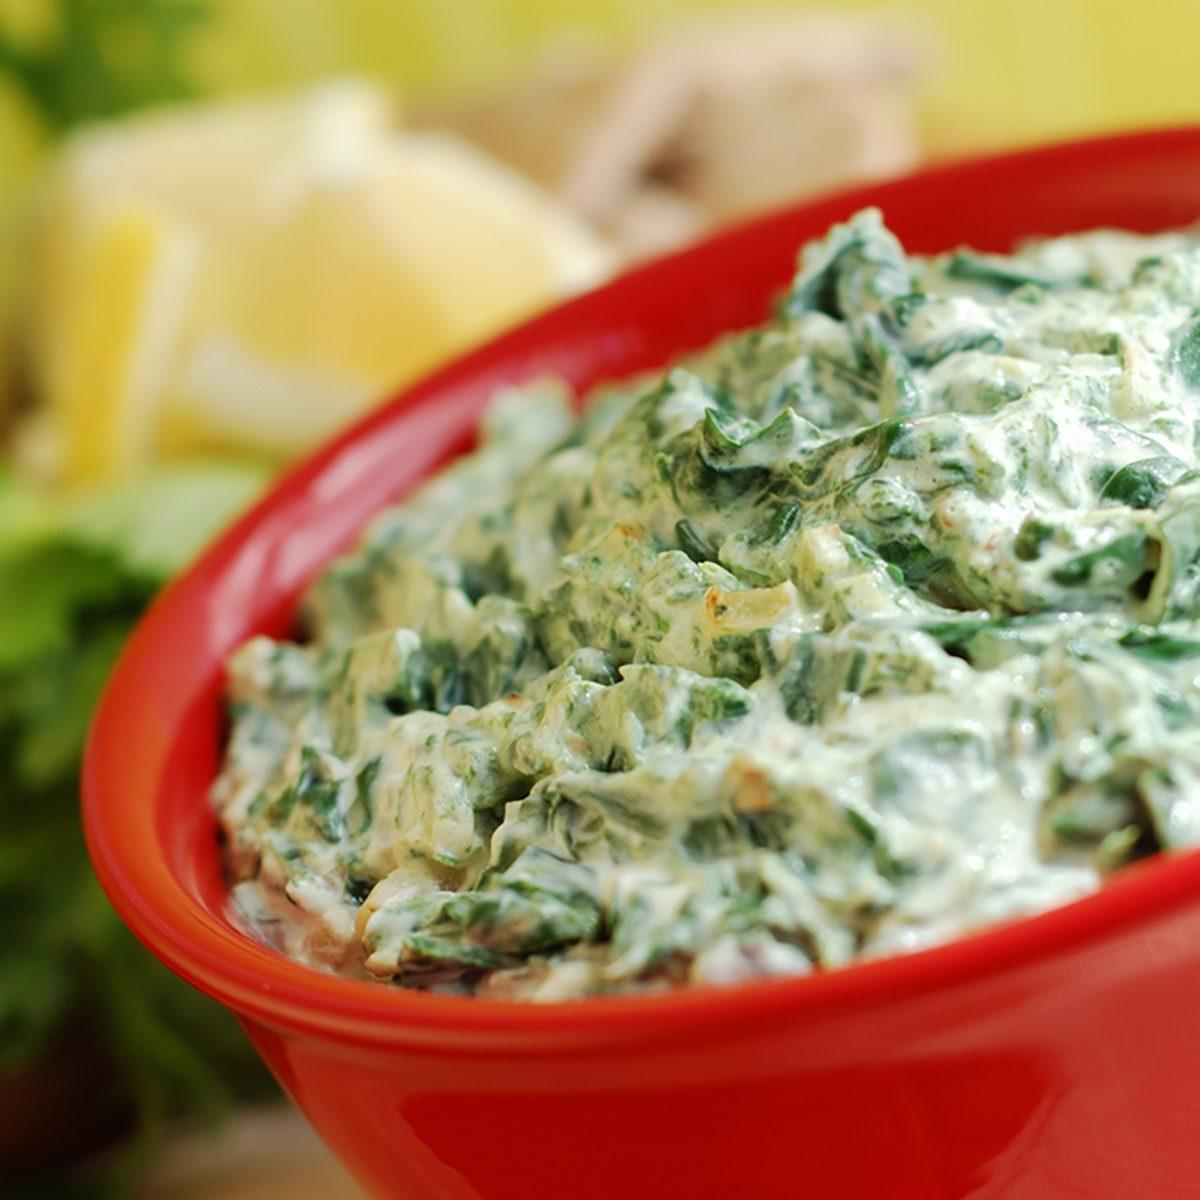 Bowl of fresh vegetarian spinach artichoke dip